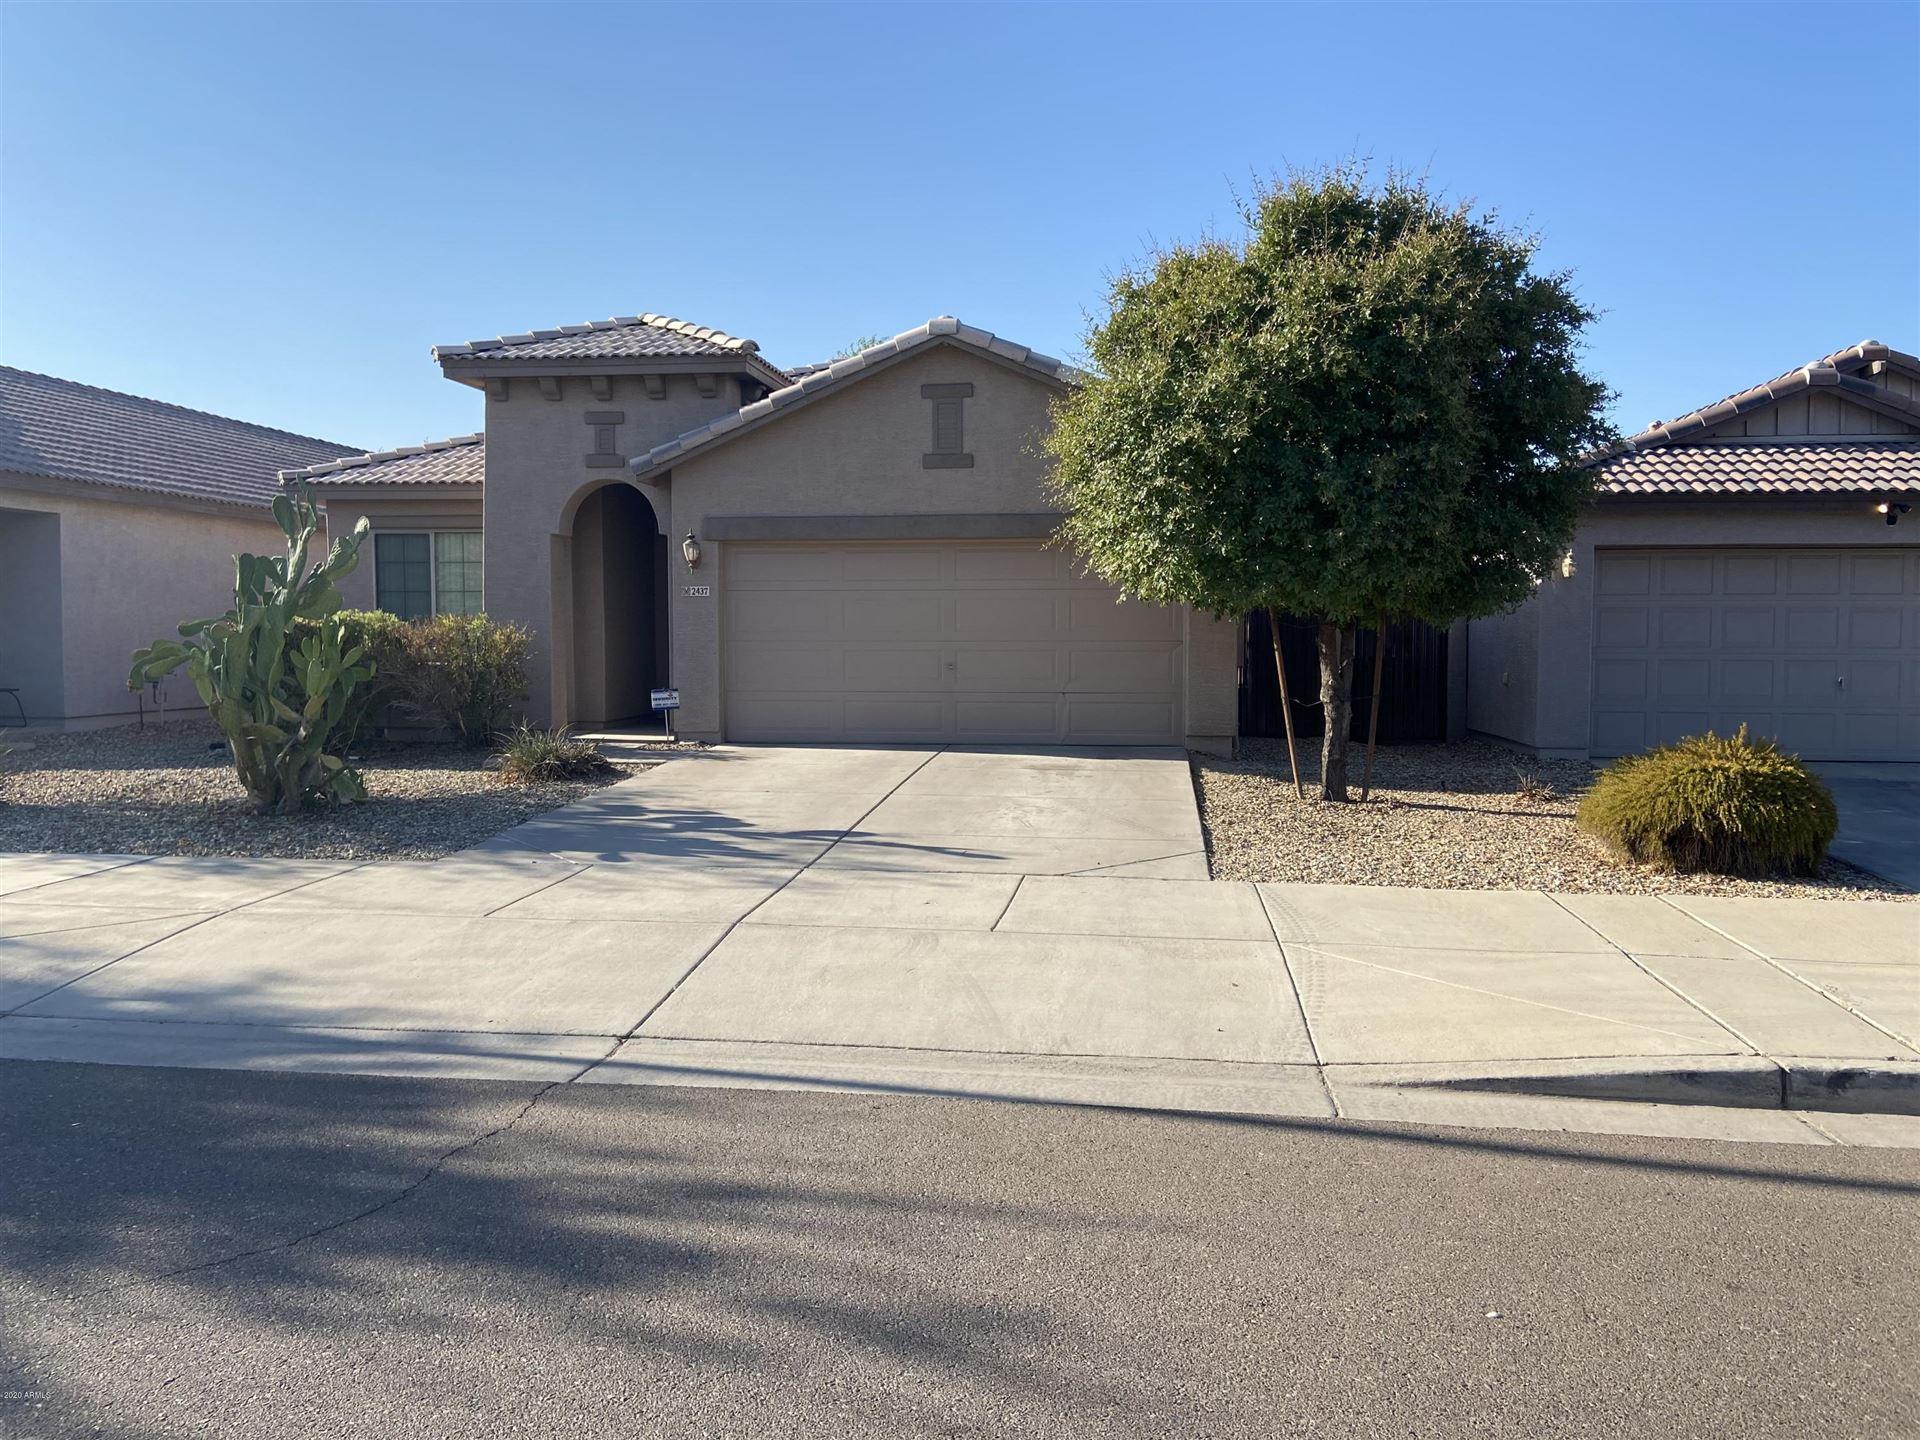 2437 W TAMARISK Avenue, Phoenix, AZ 85041 - MLS#: 6127652